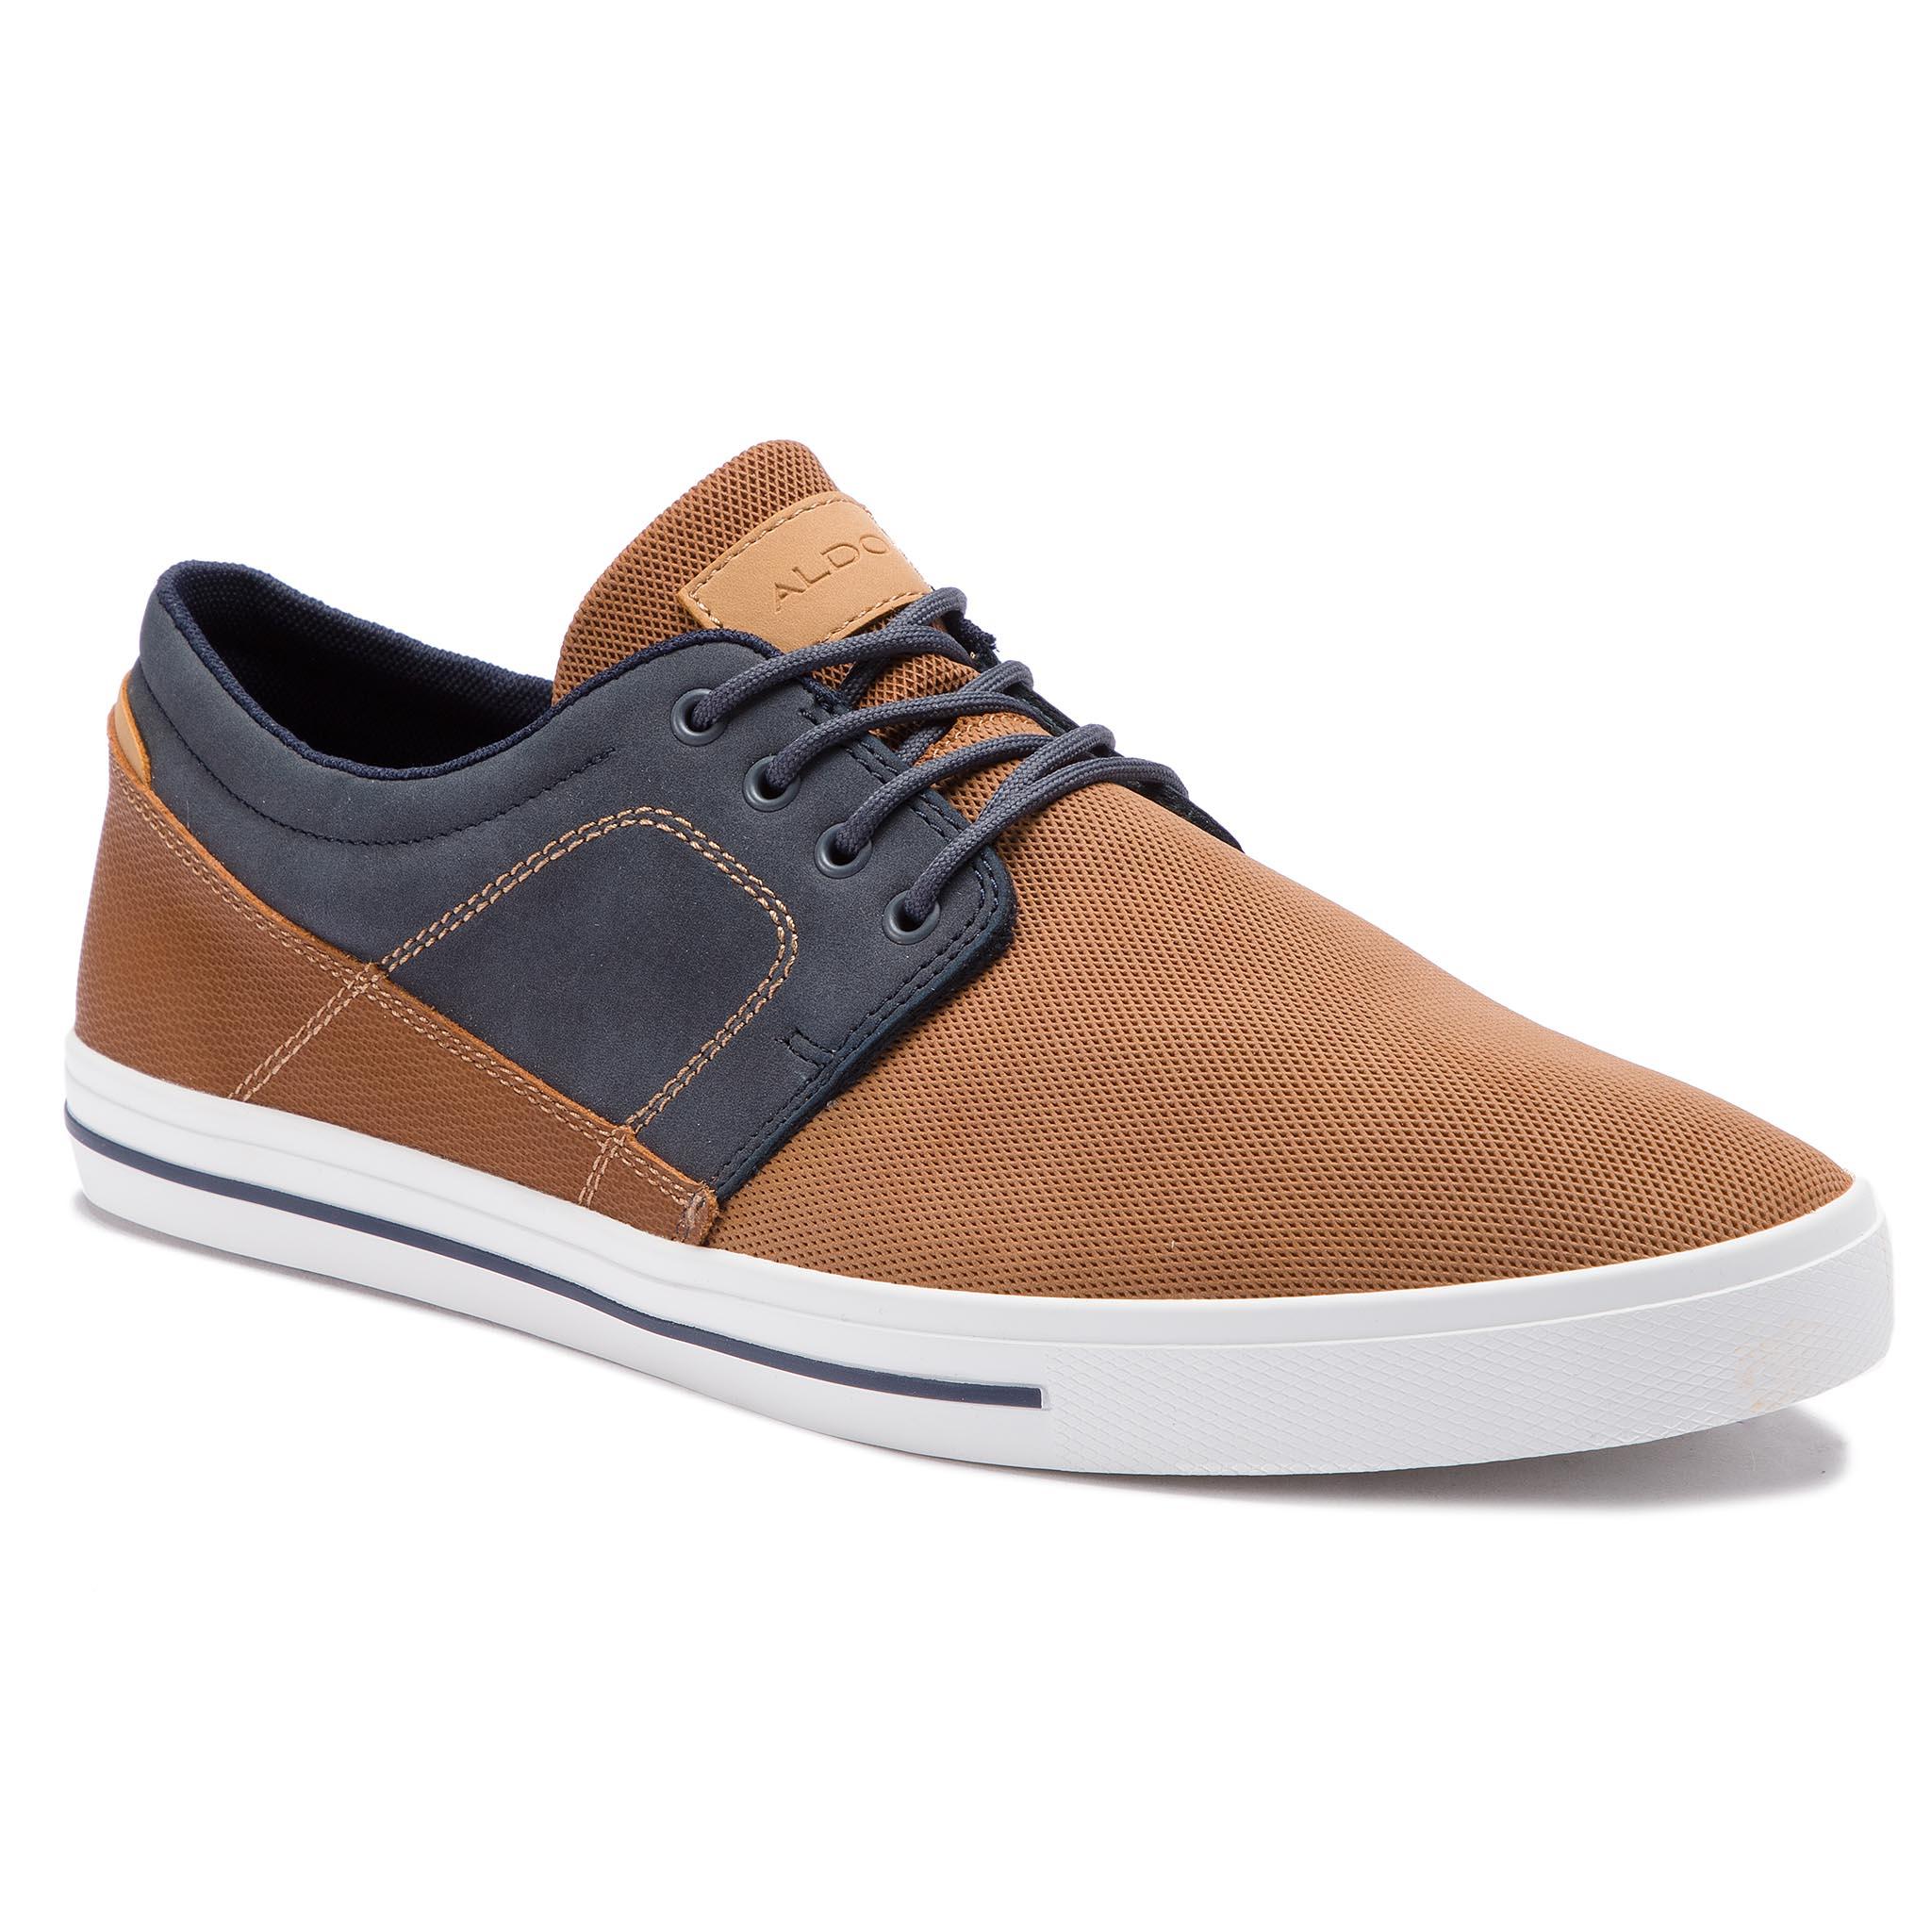 lowest price b71bf 15cf7 Shoes Reebok - Club C 85 Diamond BD4426 Oatmeal Chalk Gum - Sneakers ...